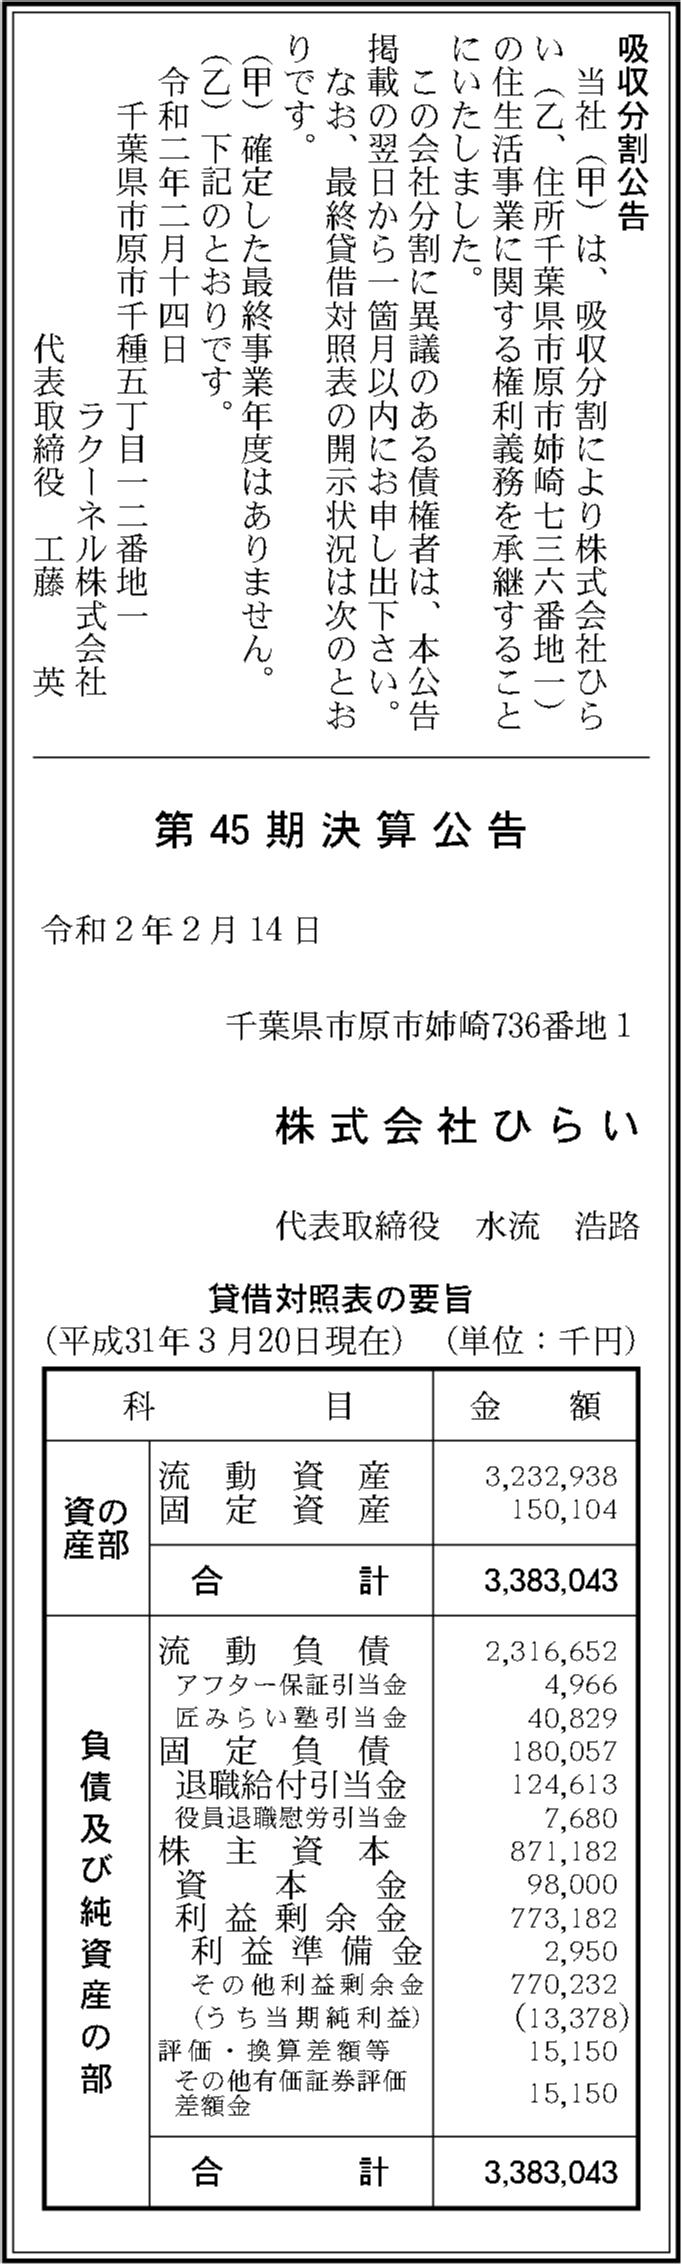 0062 c79a472ab6dee0b0f686a0476e282d4ce781d7f6988a87cfbdc5b1357f005c4f8106e9f41b0f2e3b23bfd748331f771d4c6373ea4c0cdac63c00f546fce2def3 03